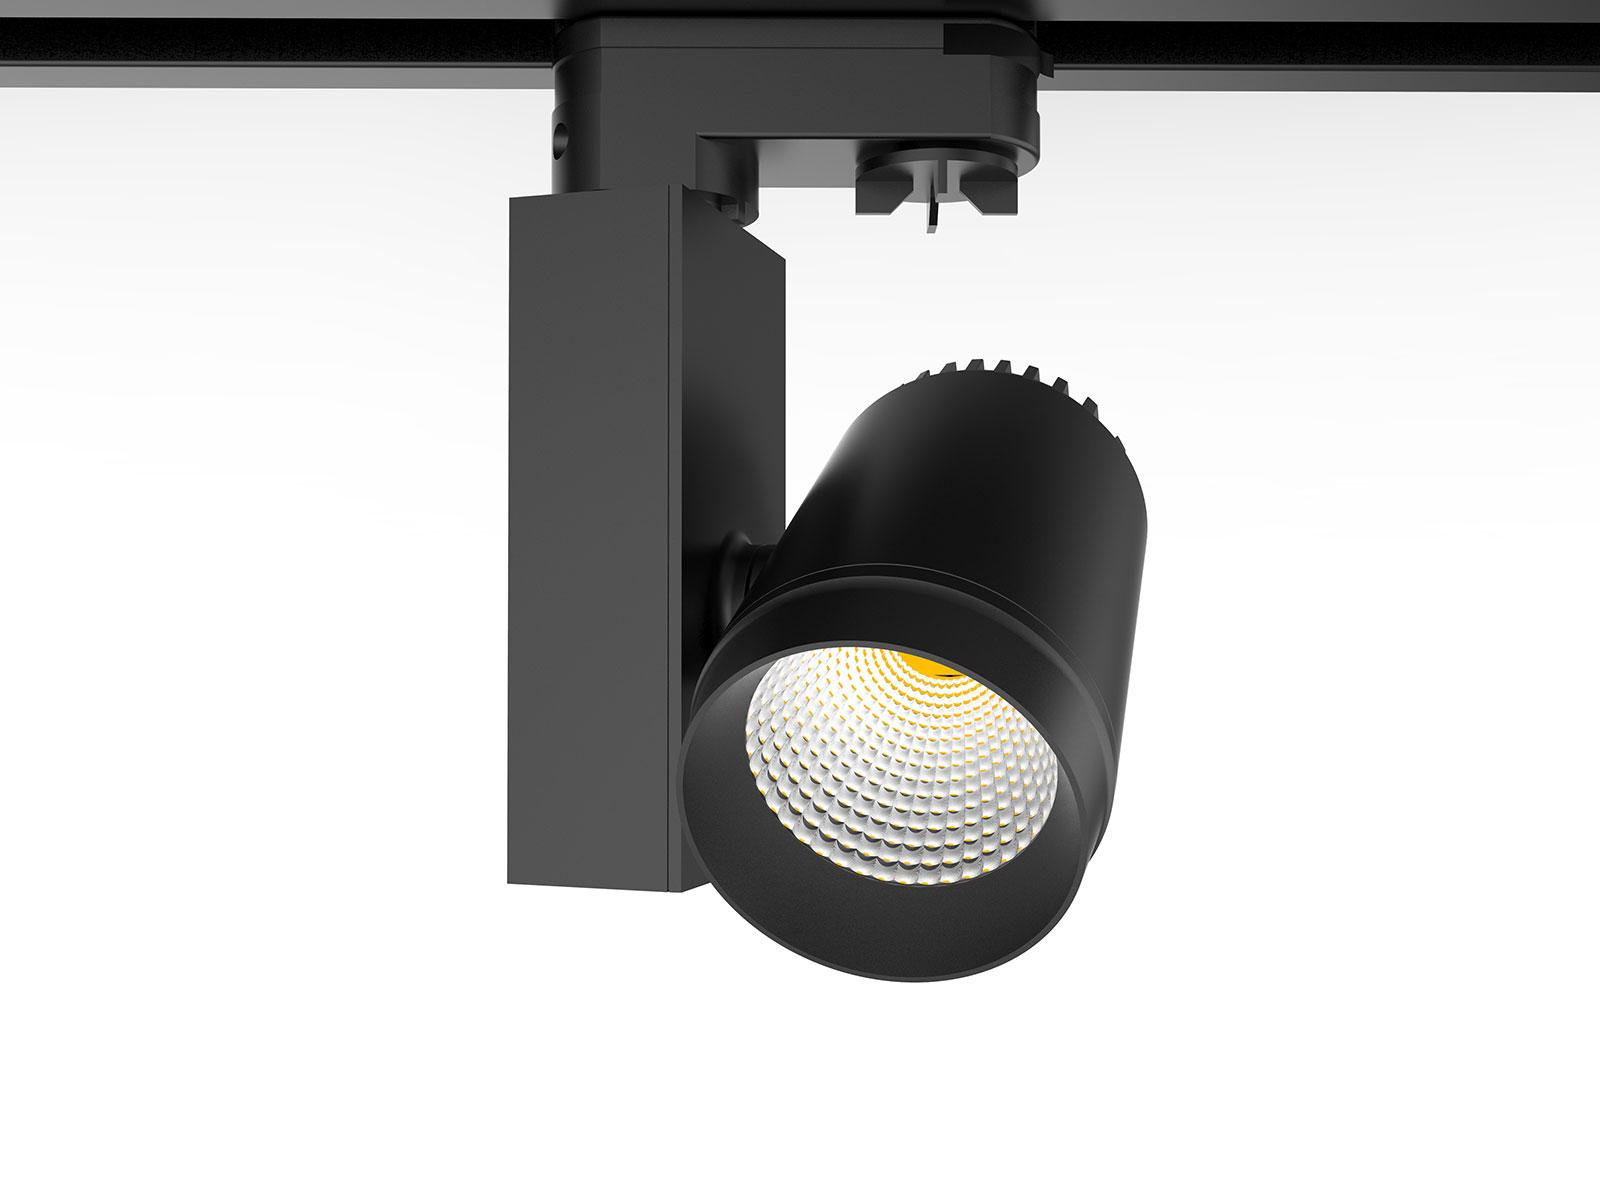 Image of: 12w High Cri Led Track Light Upshine Lighting